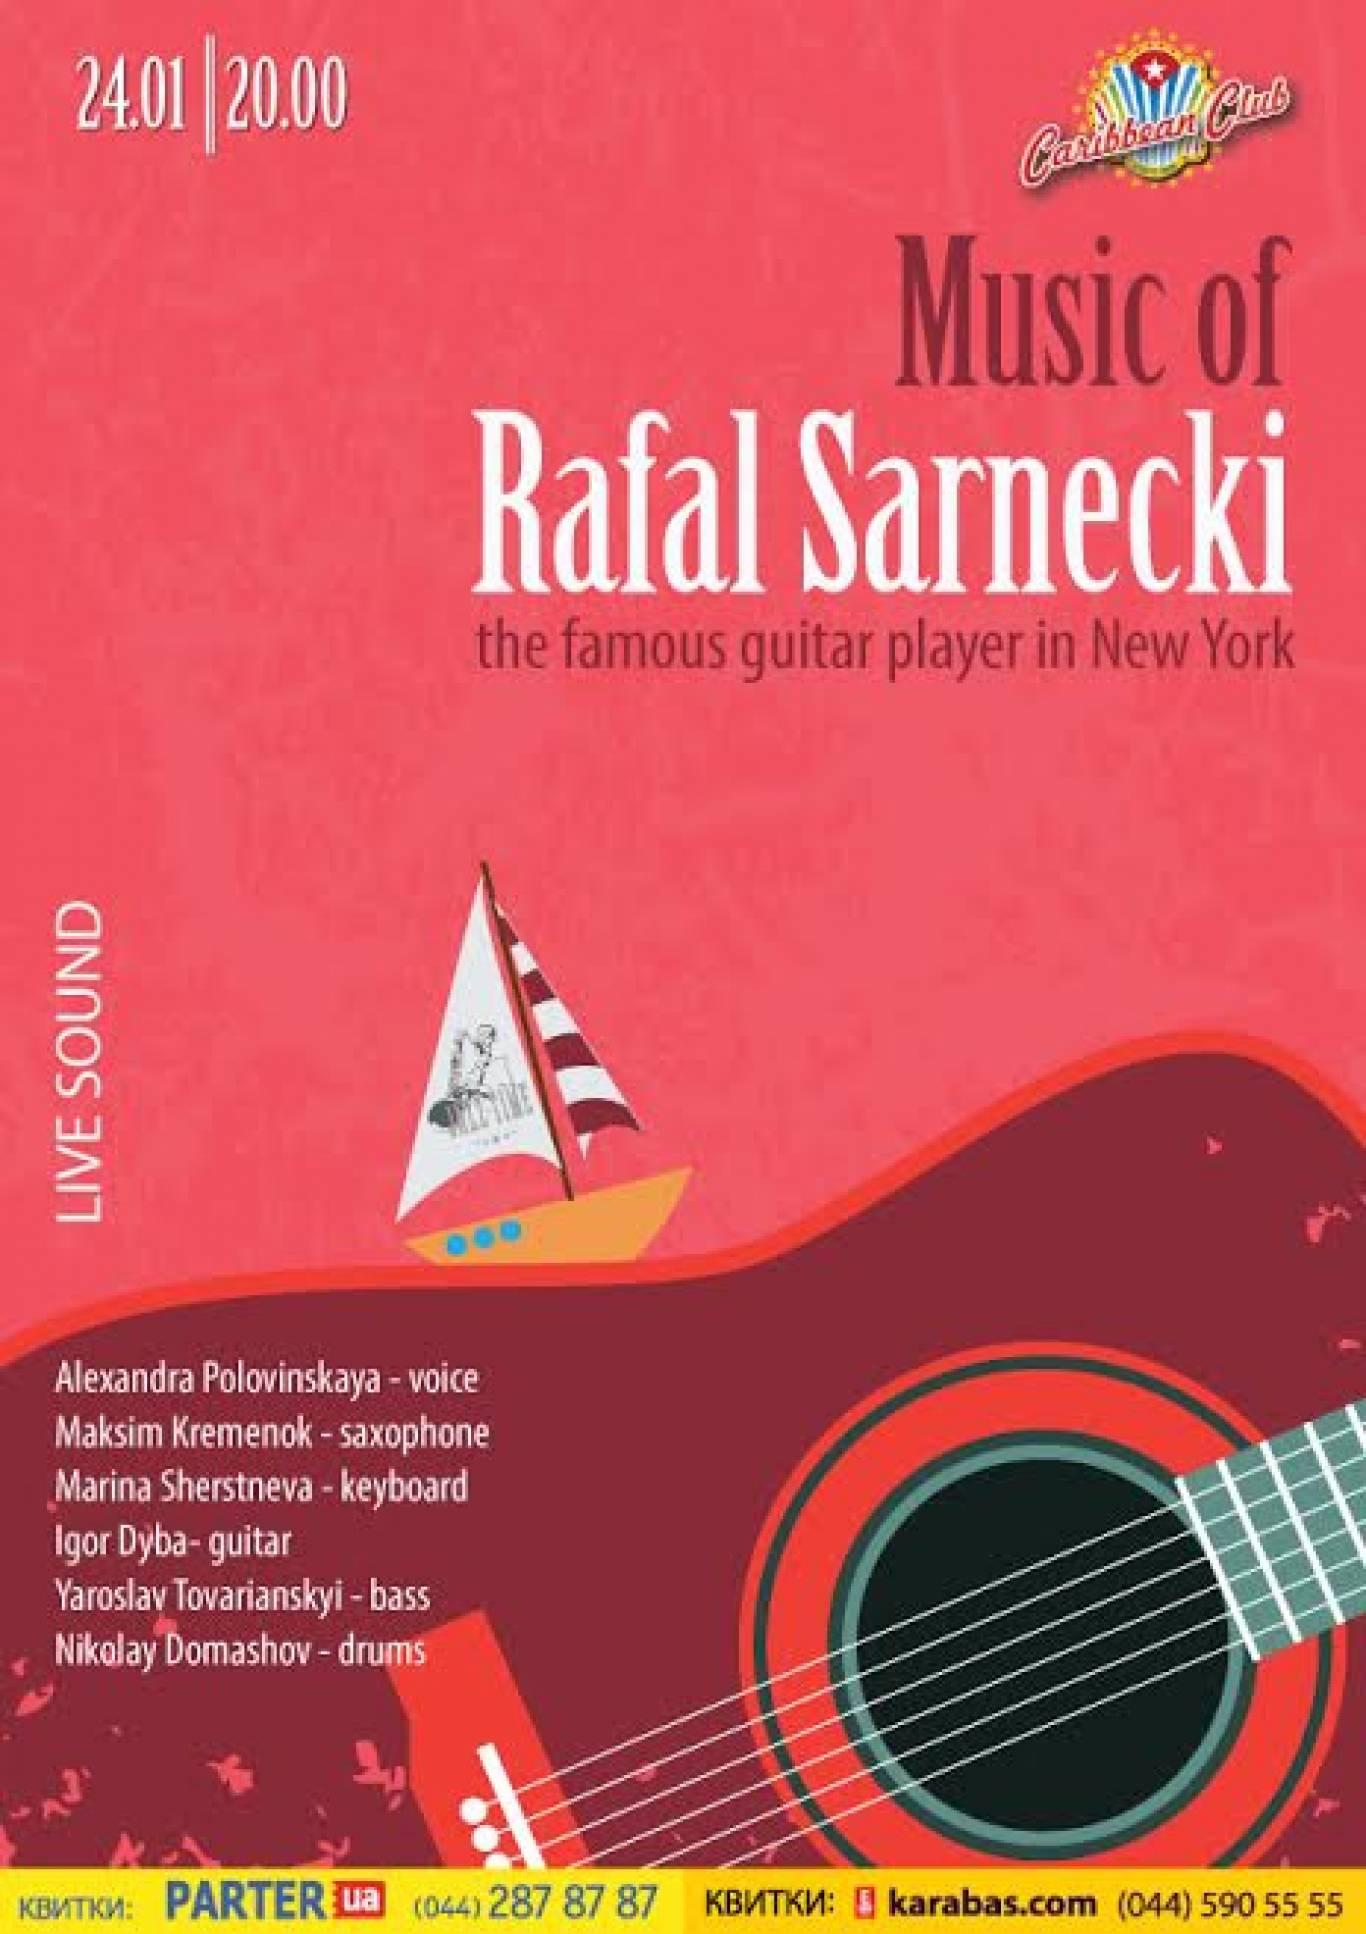 Music of Rafal Sarnecki